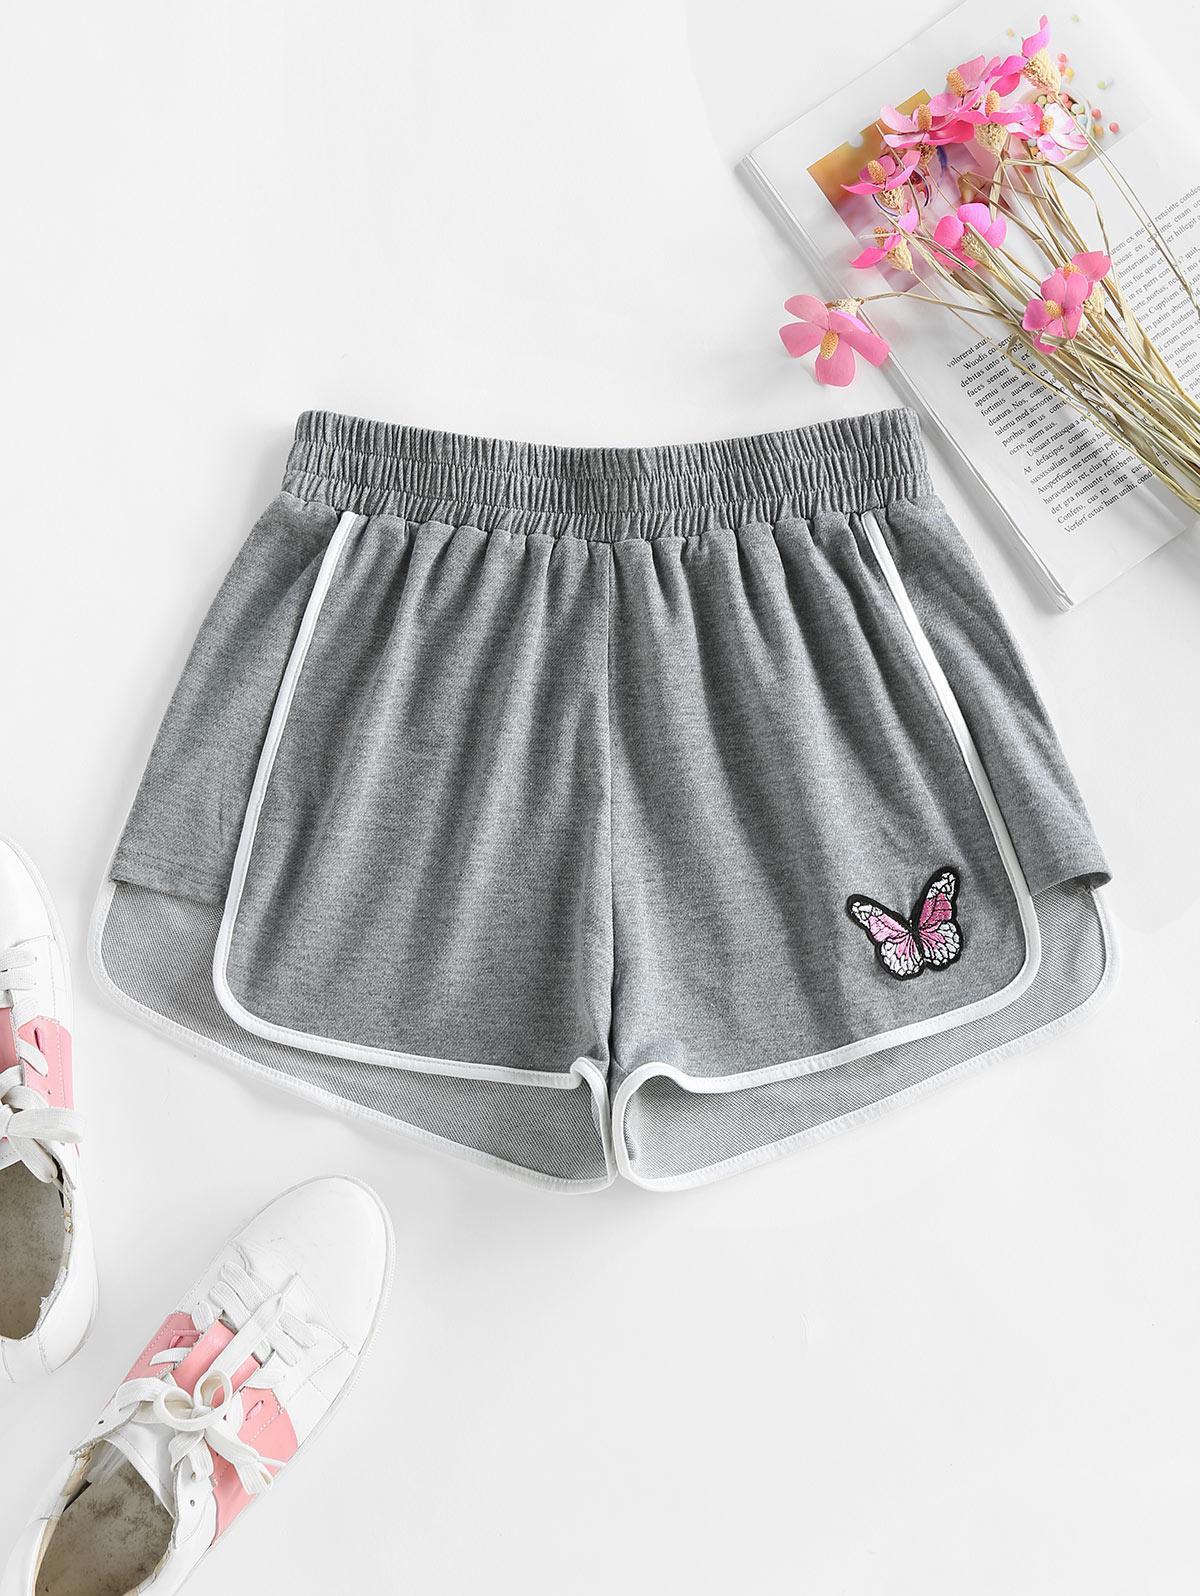 ZAFUL Binding Butterfly Applique Pull-on Sweat Shorts